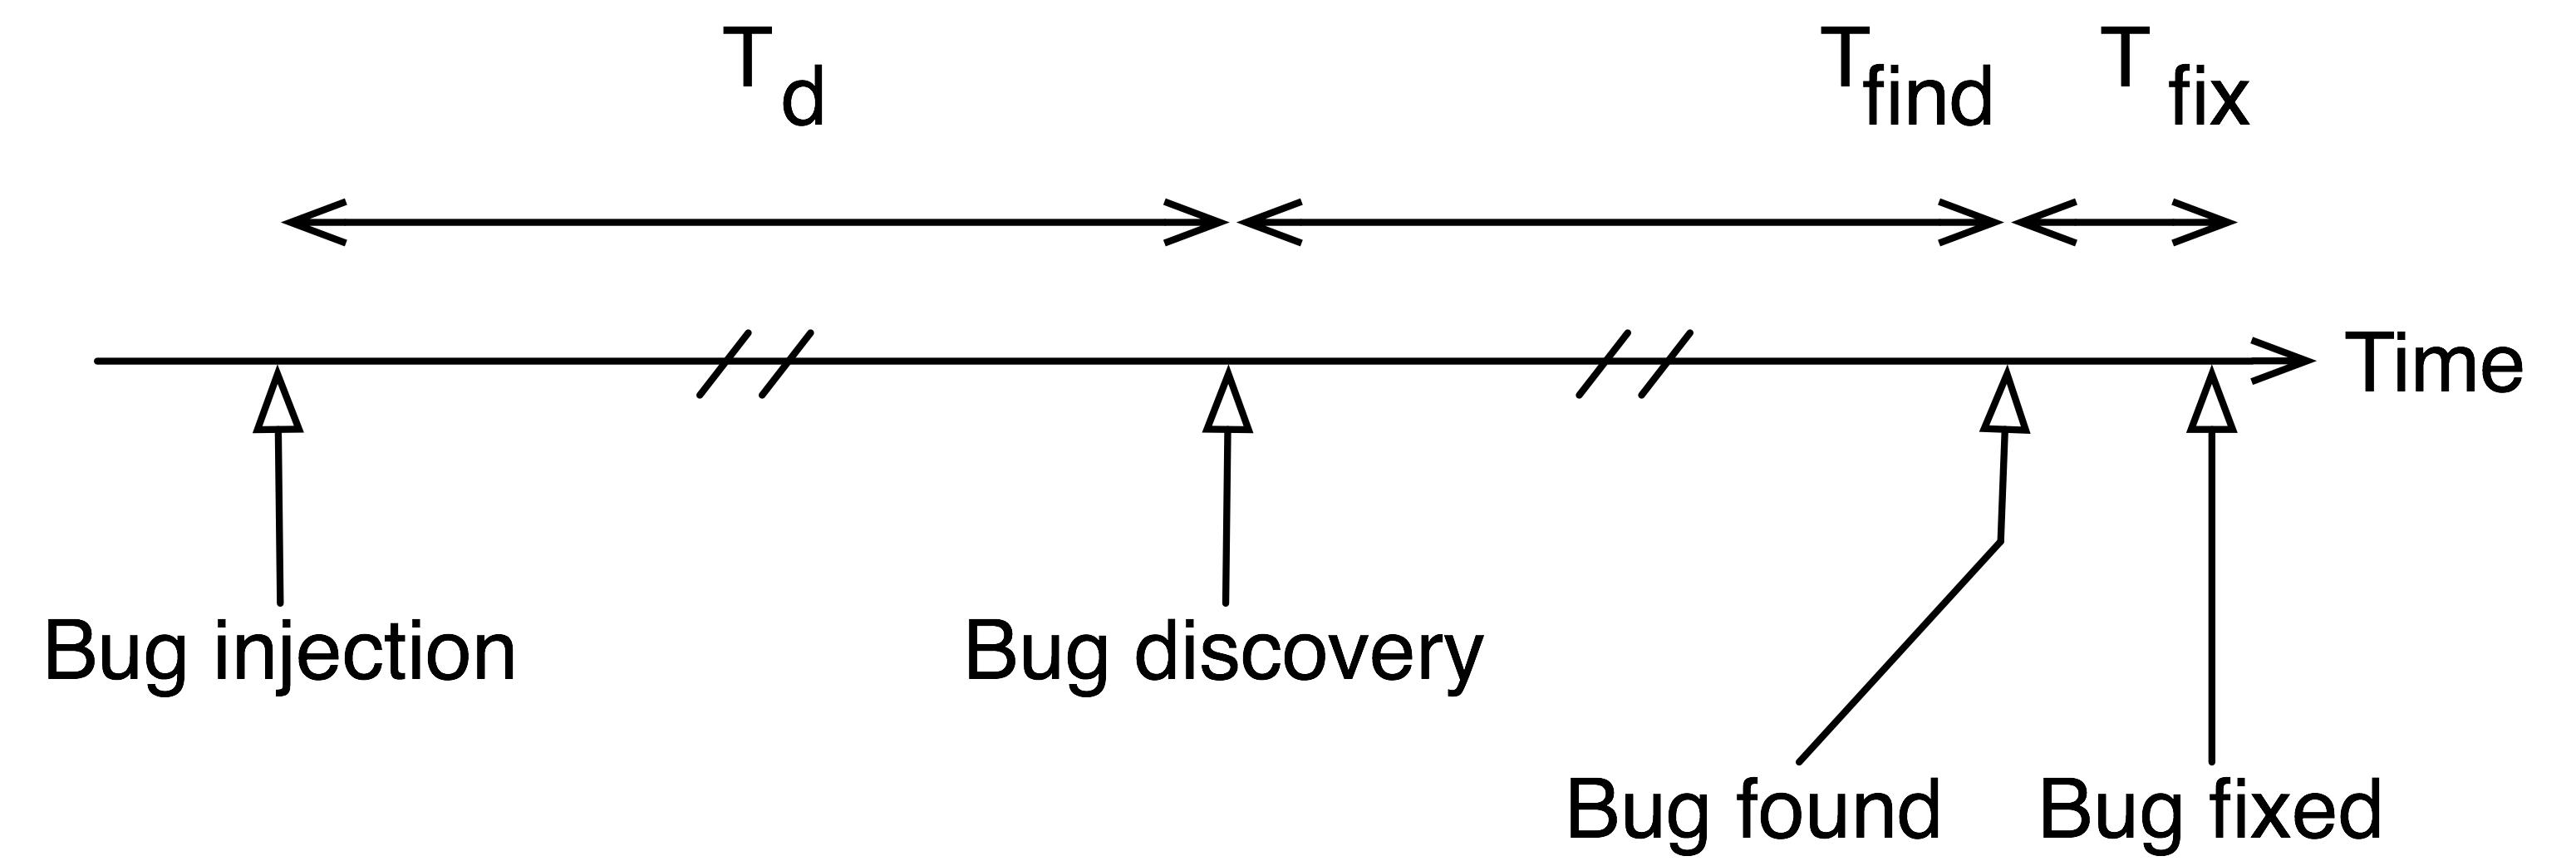 Physics of Test Driven Development | James Grenning's Blog